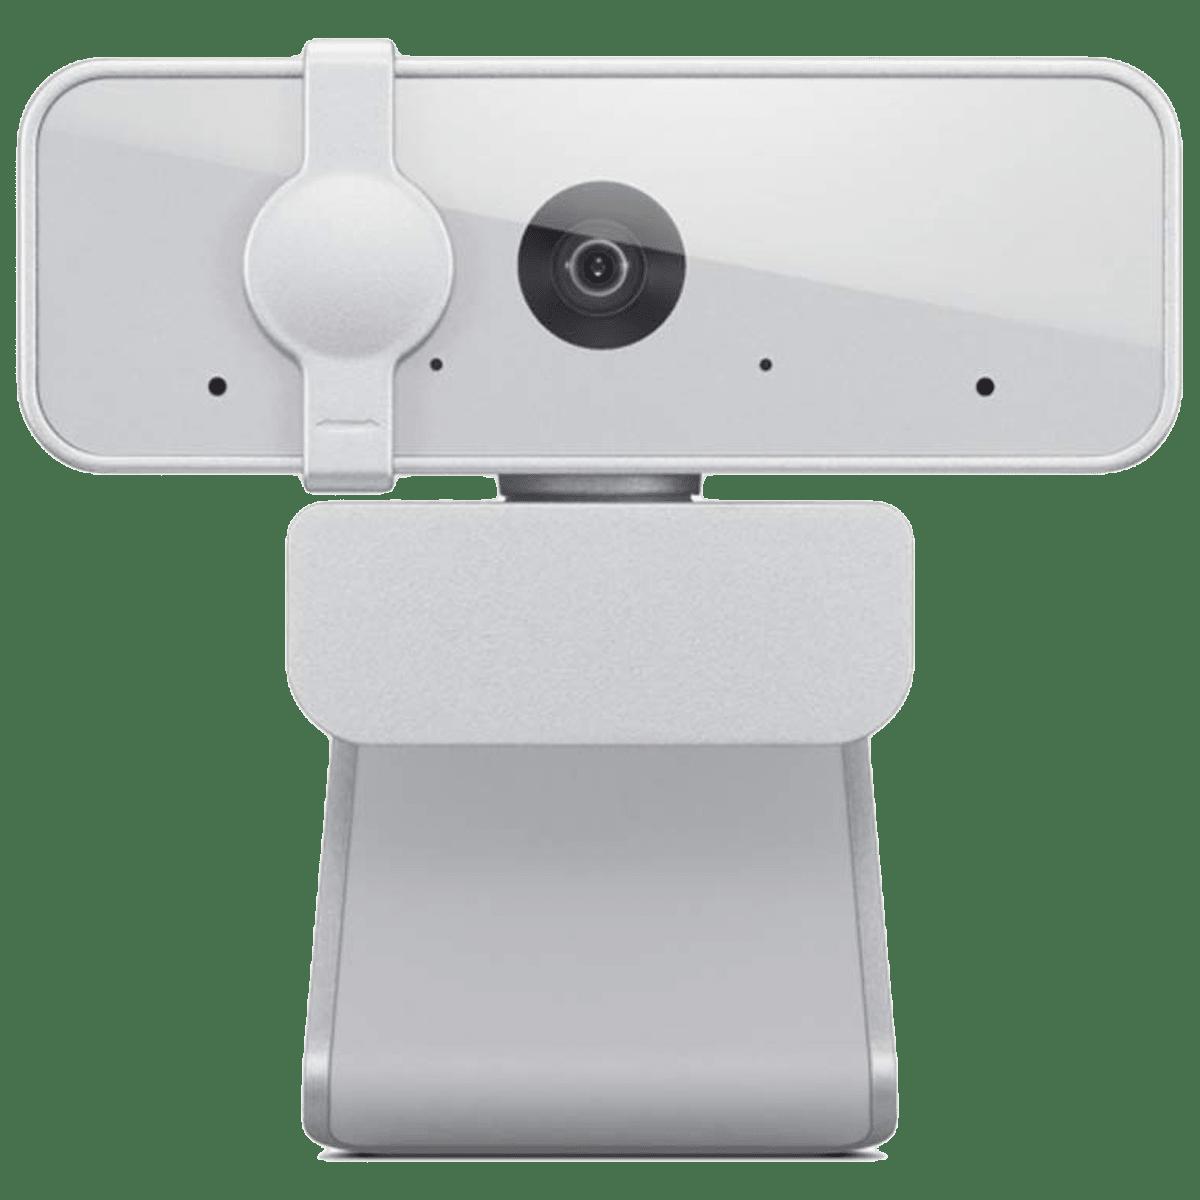 Lenovo 300 USB 2.1 MP Web Cam (Full HD Video Call, GXC1B34793, Cloud Grey)